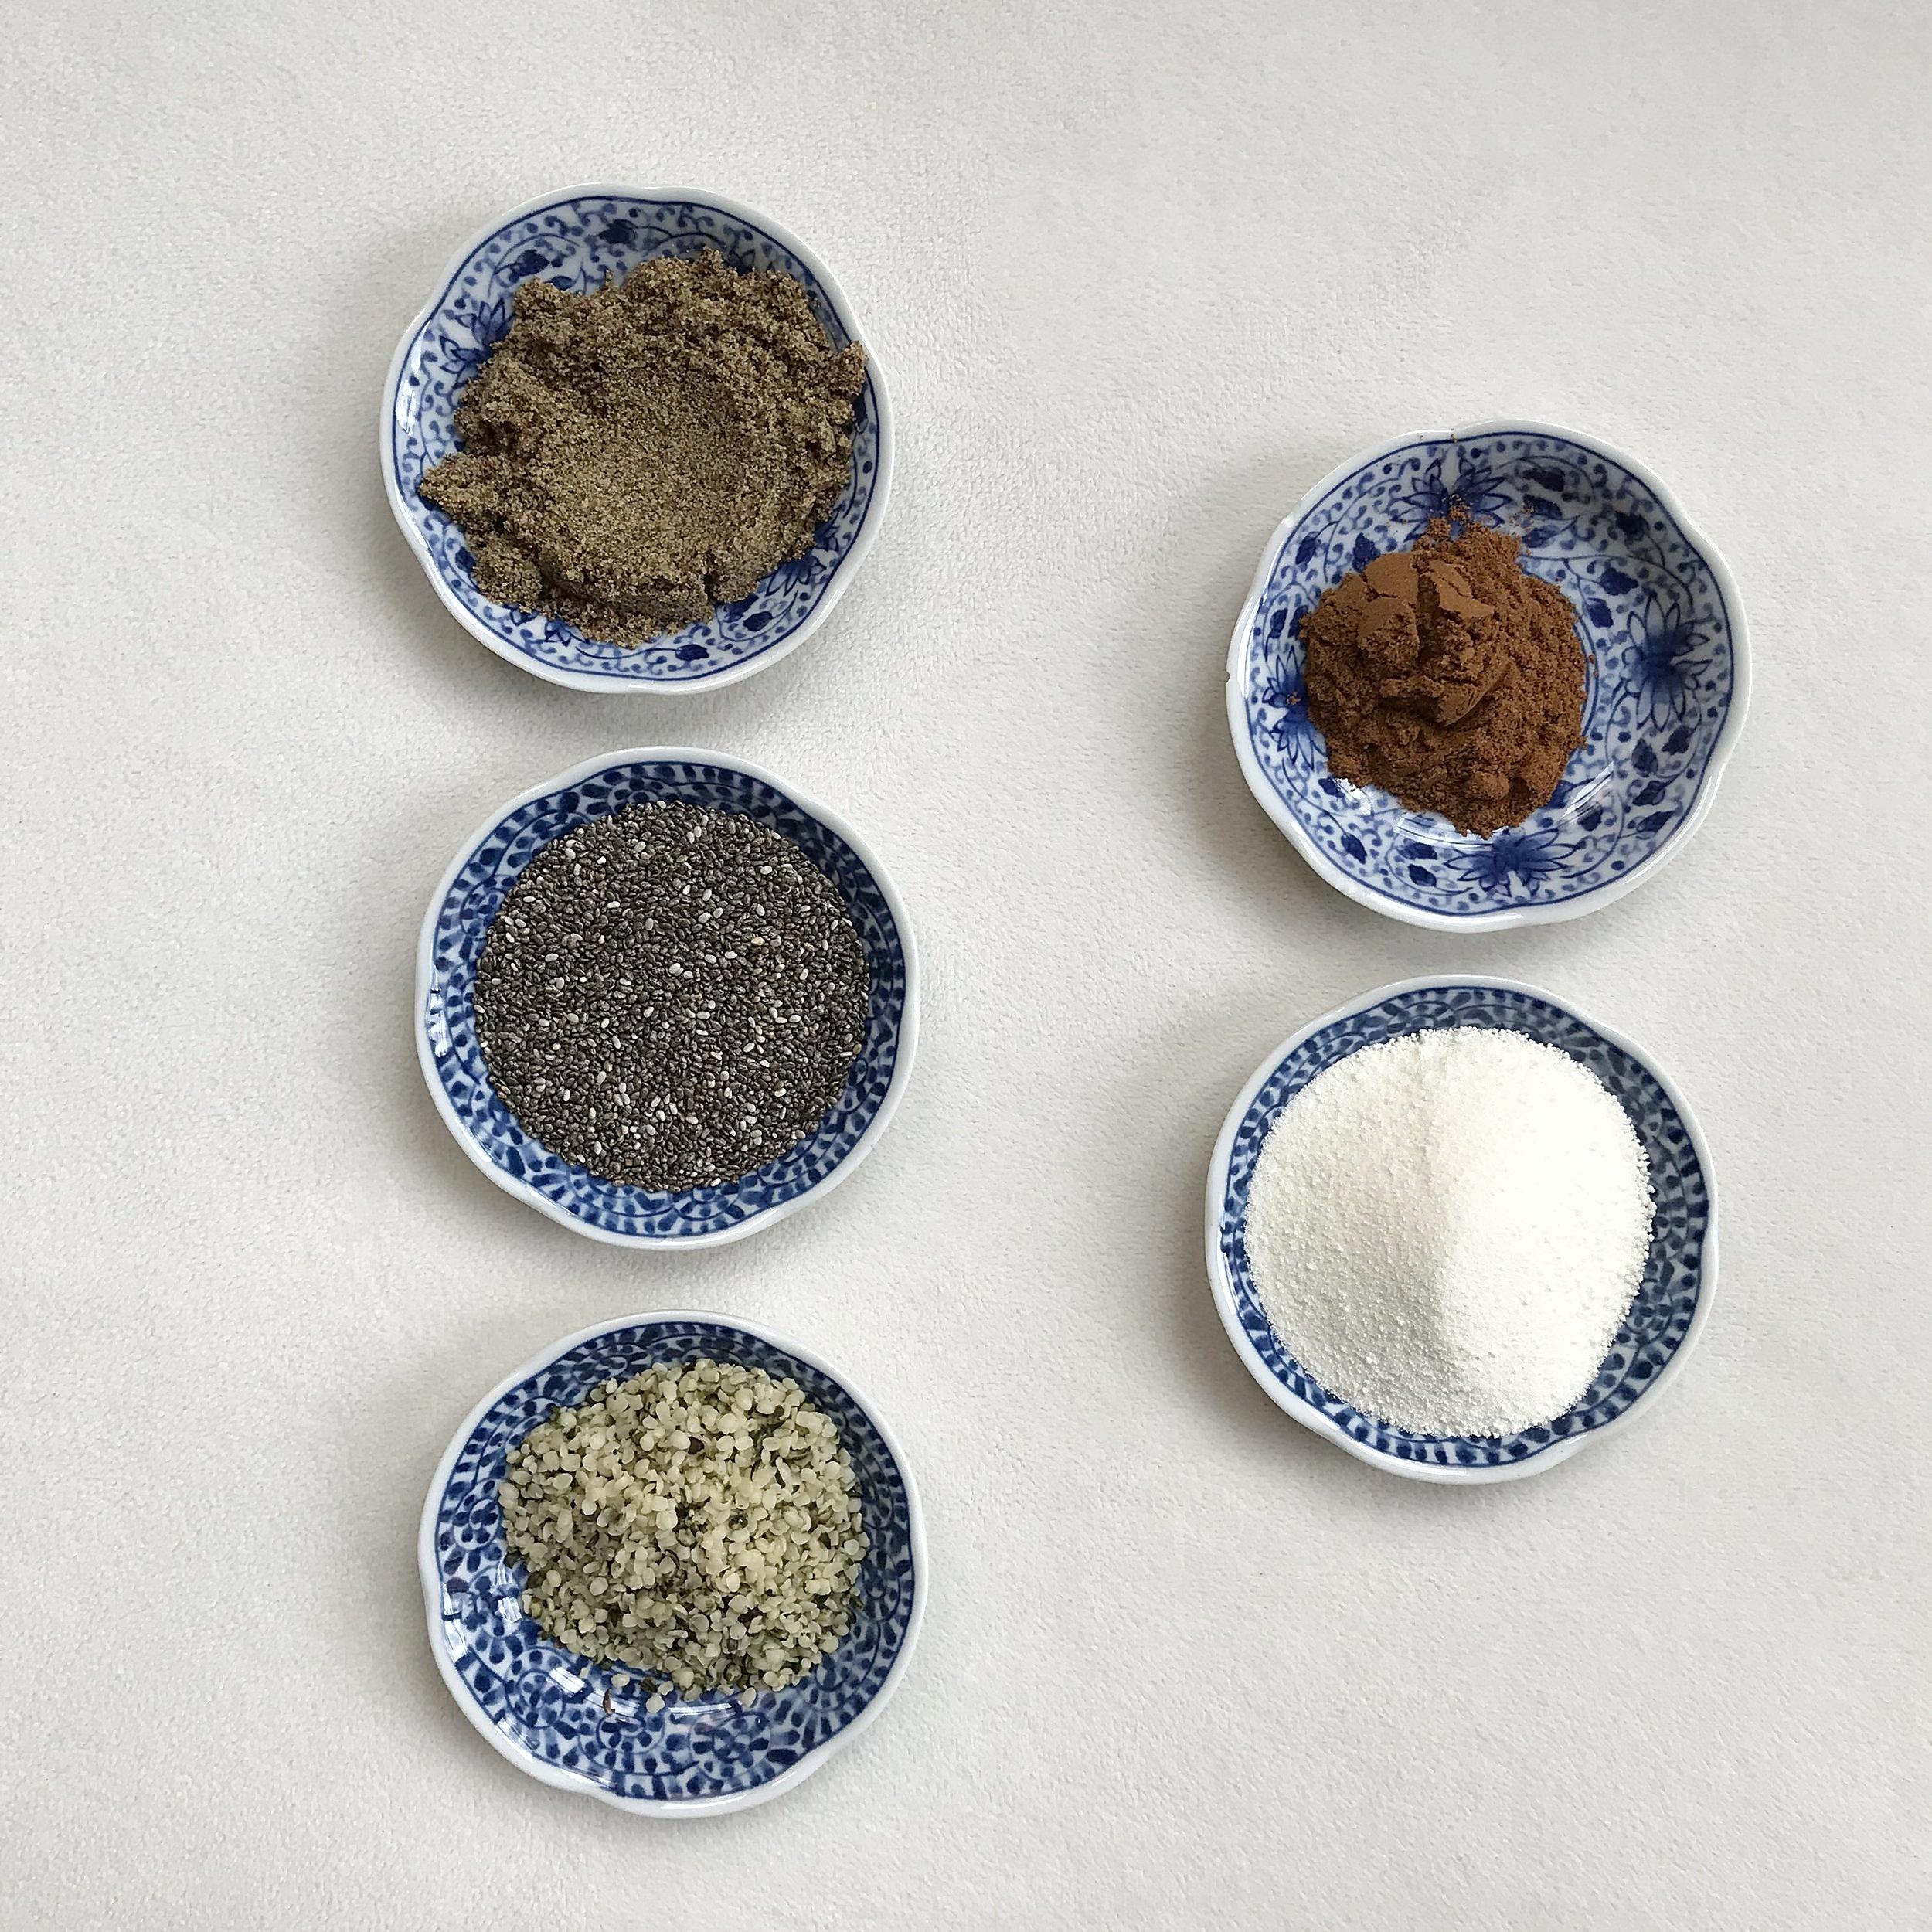 misfit wellness grain-free breakfast cereal